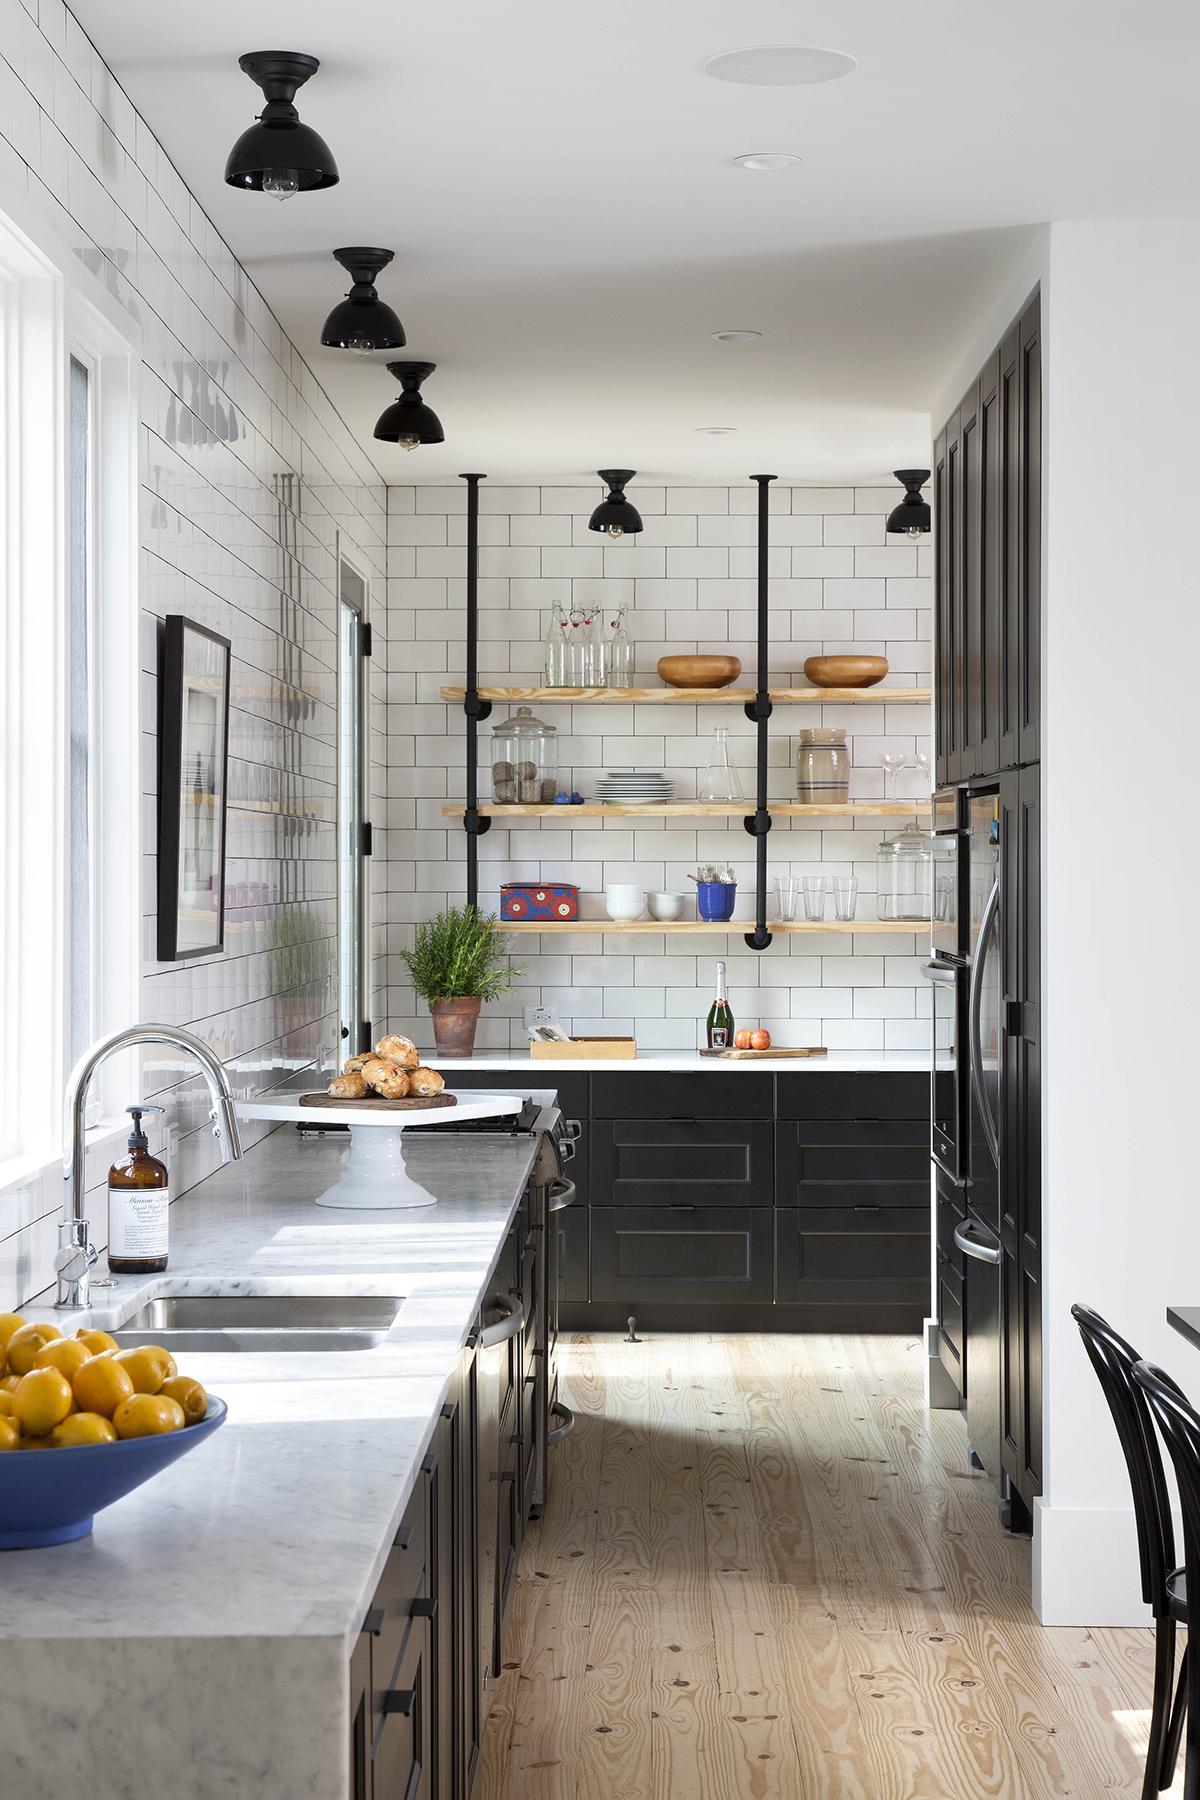 Декор кухни в стиле кантри: белая мраморная столешница